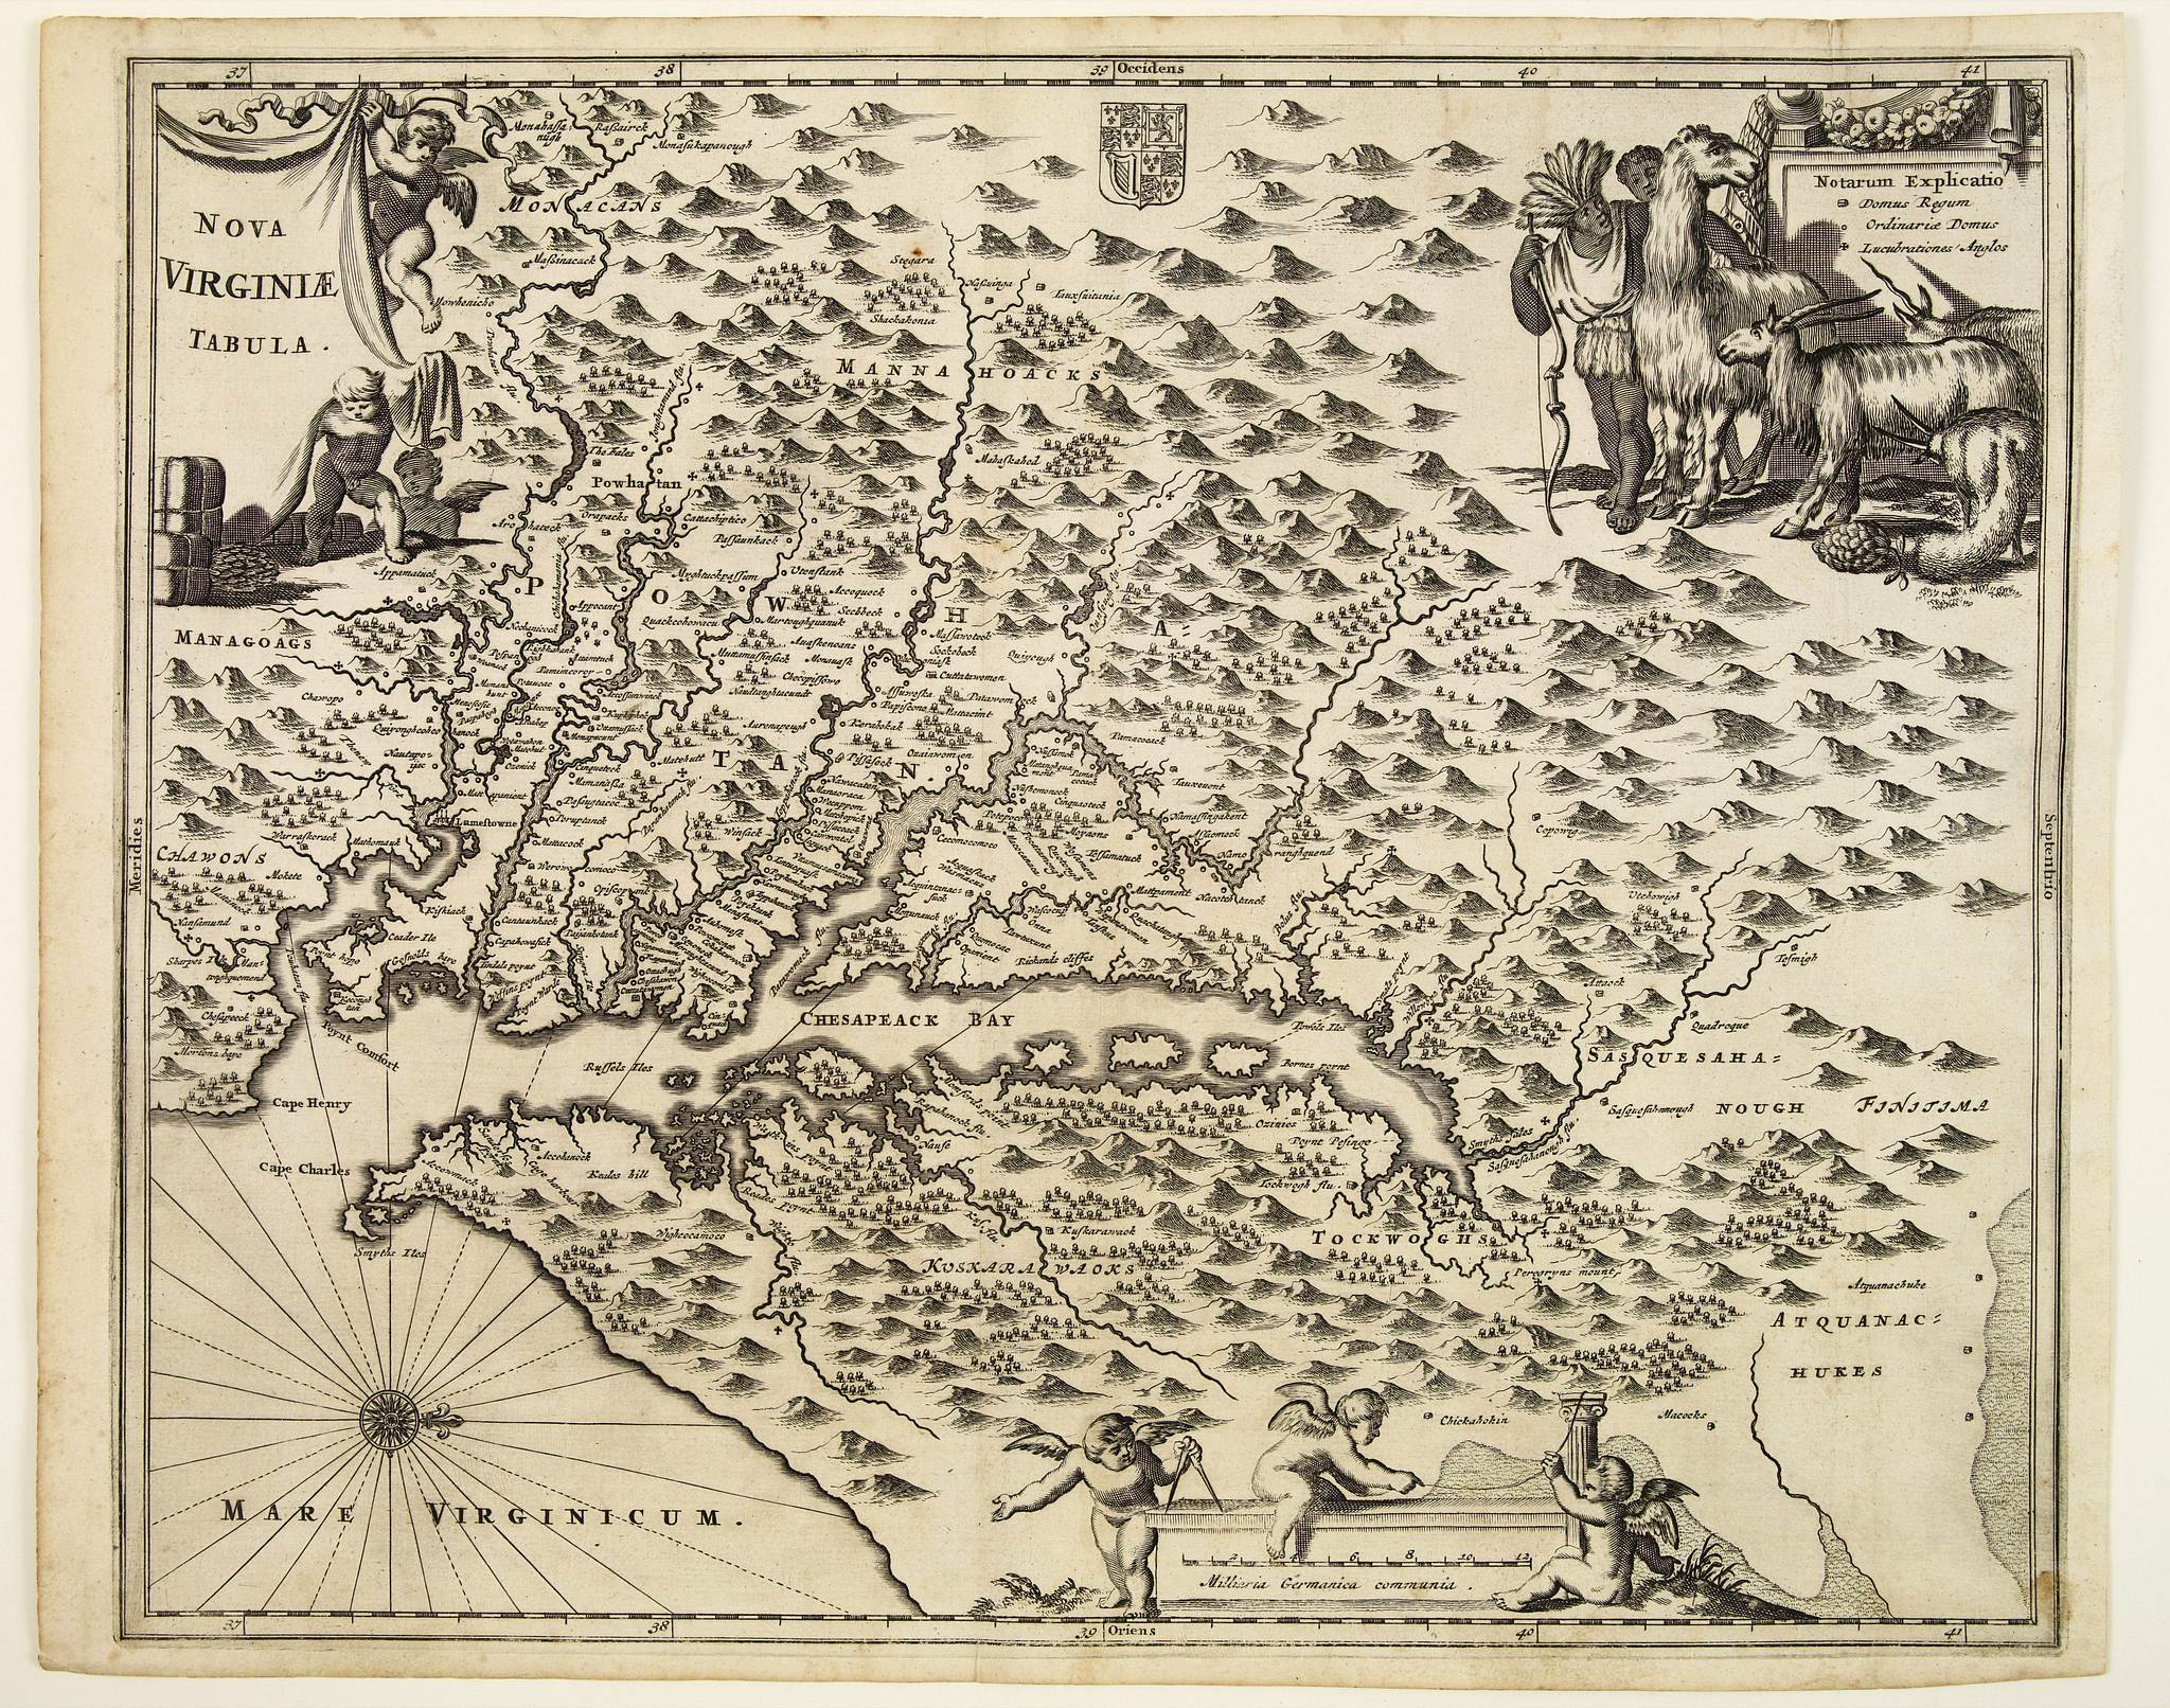 MONTANUS, A. / OGILBY, J. -  Nova Virginia Tabula.